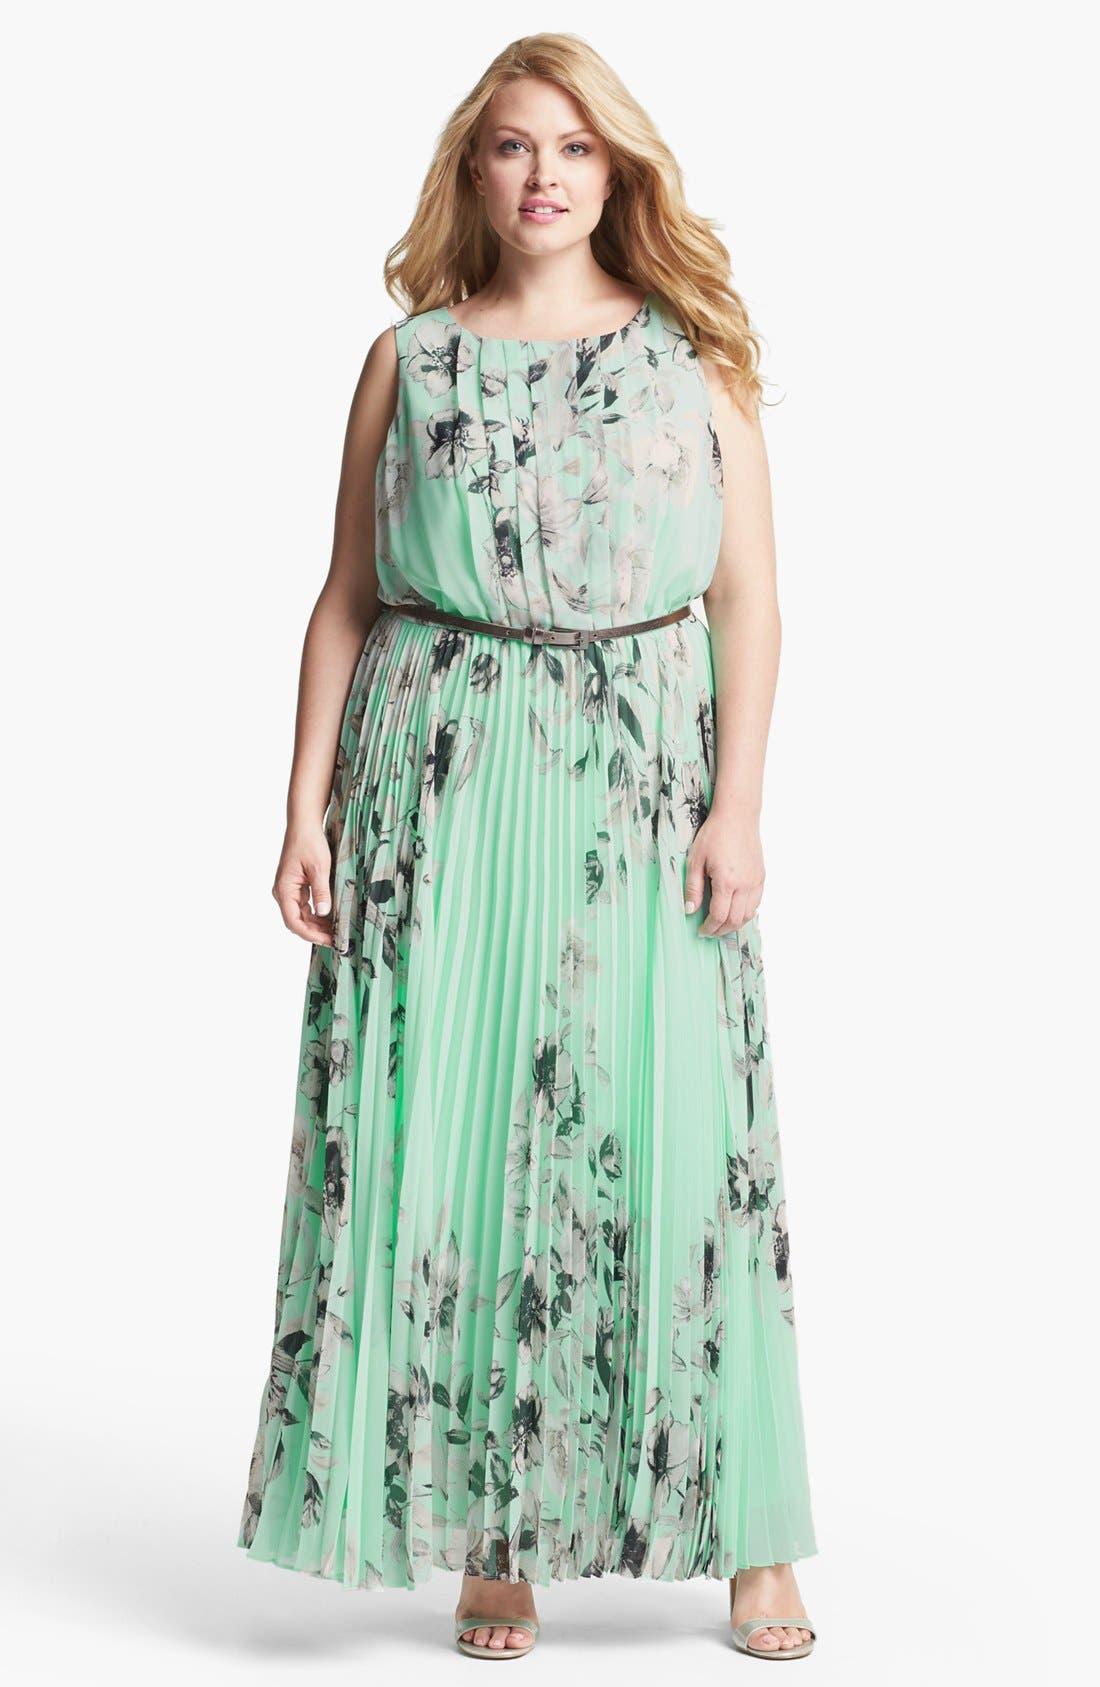 Alternate Image 1 Selected - Eliza J Floral Sleeveless Print Chiffon Maxi Dress (Plus Size)